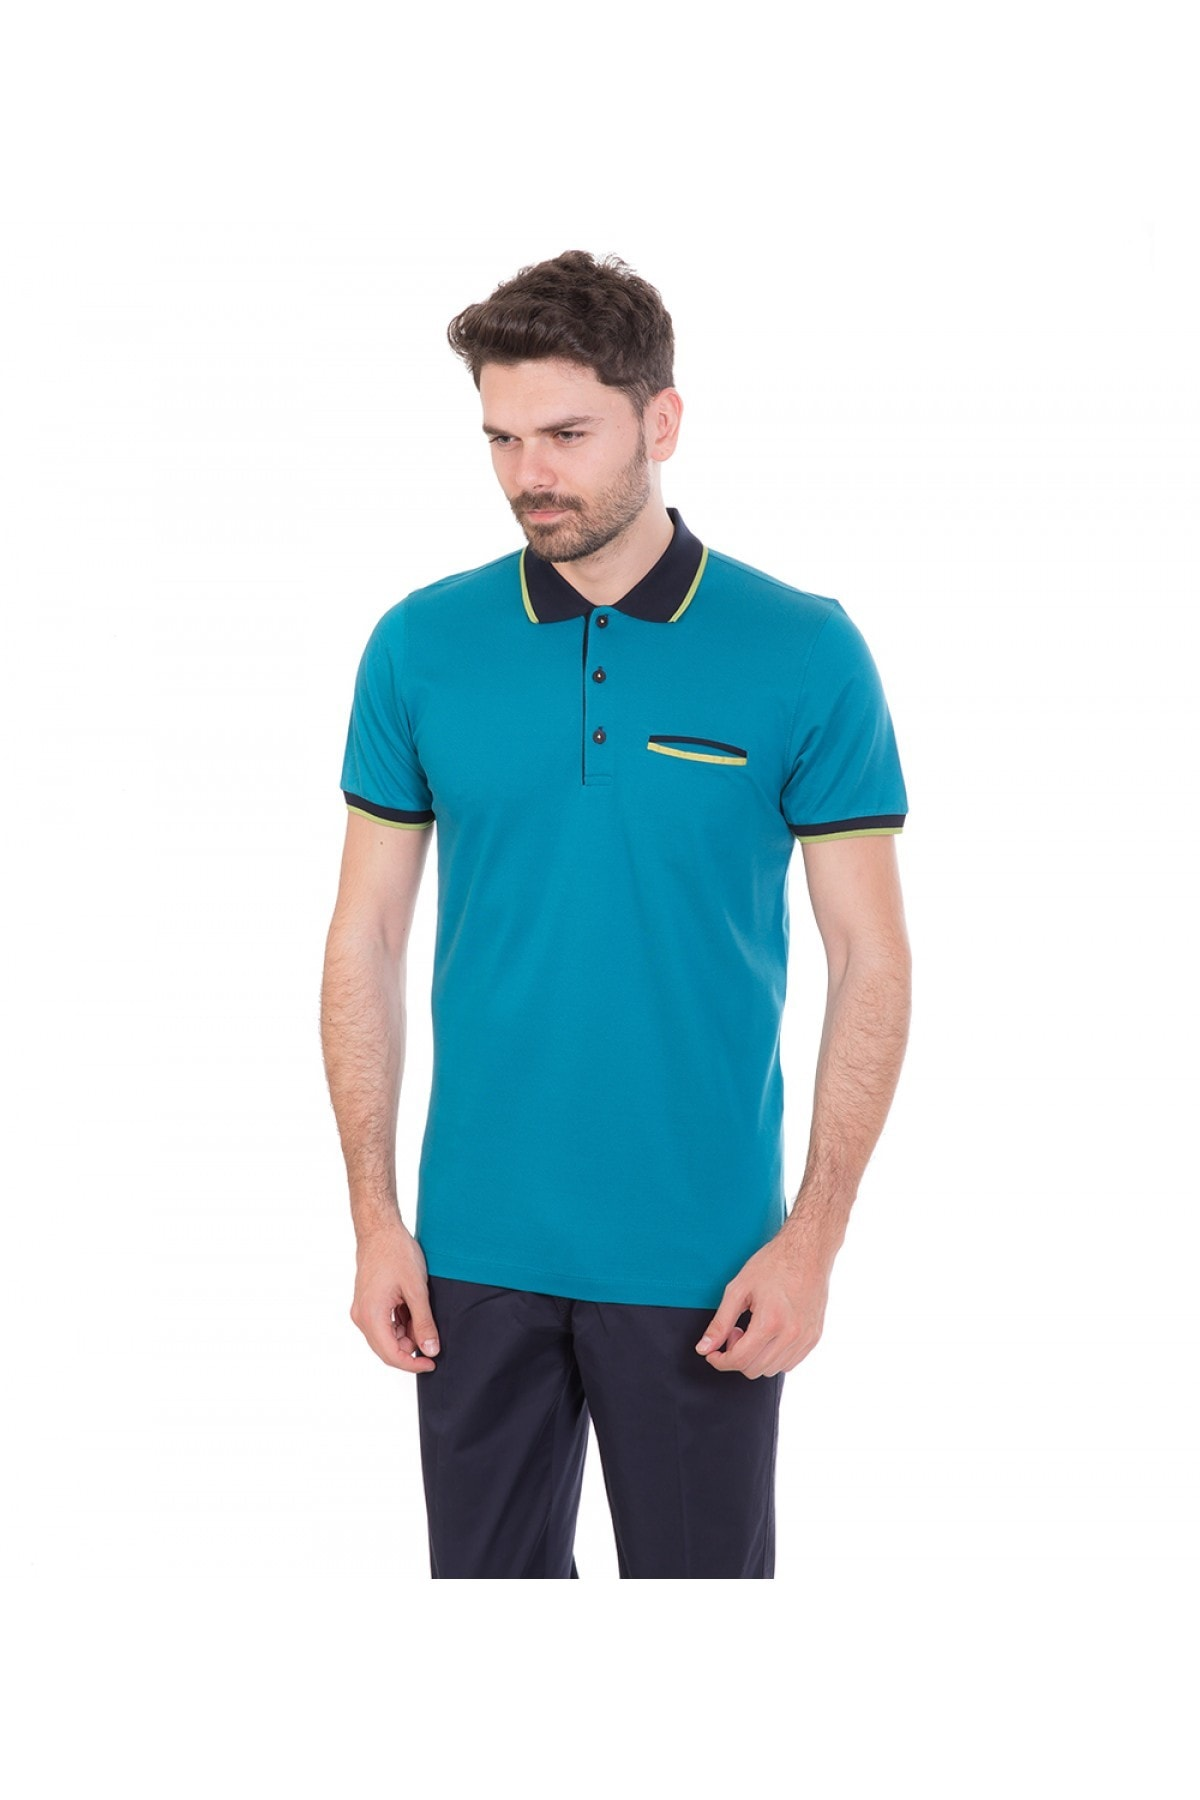 Karaca Petrol Erkek T-Shirt - 116206017